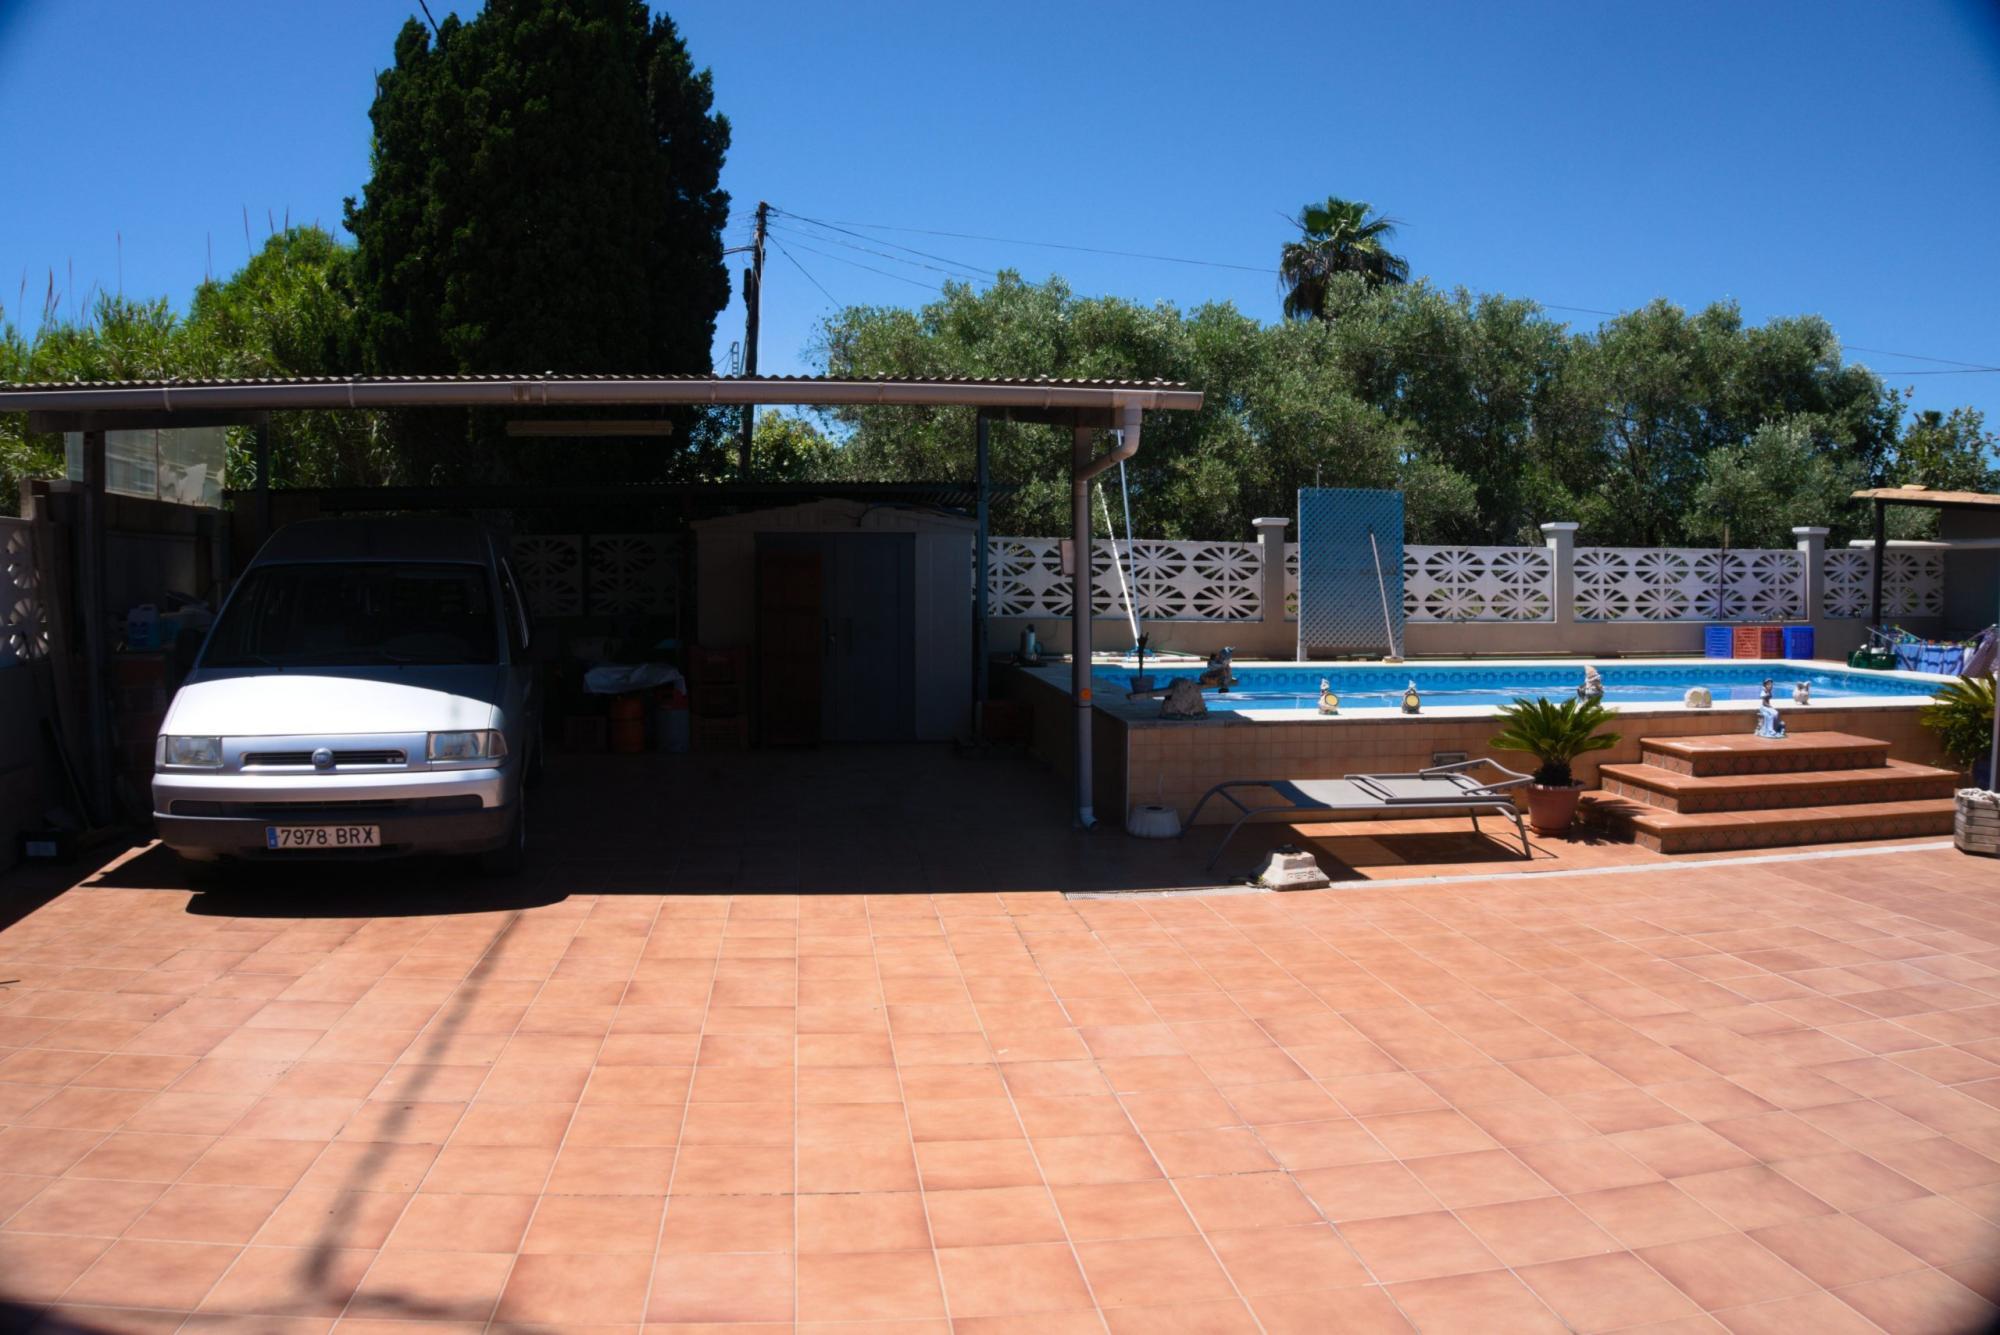 Chalet en venta en Burriana (Castellón) zona puerto